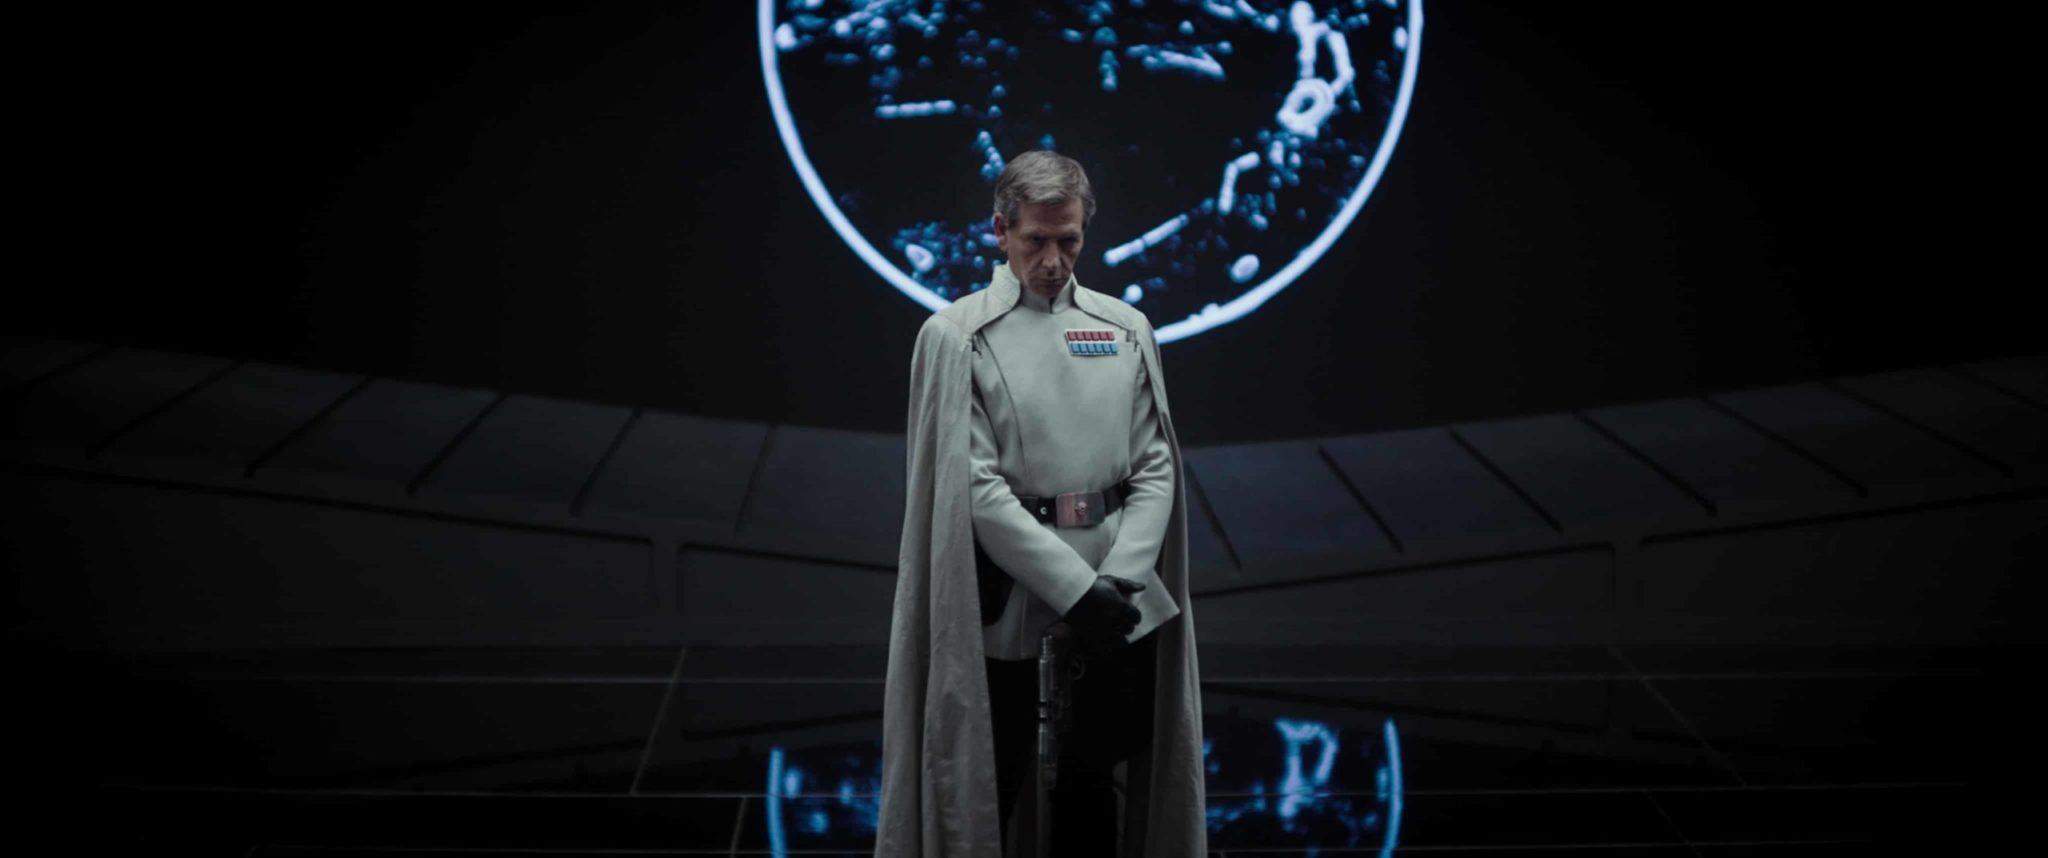 Rogue One: A Star Wars Story - Director Krennic (Ben Mendelsohn) Ph: Film Frame ©Lucasfilm LFL